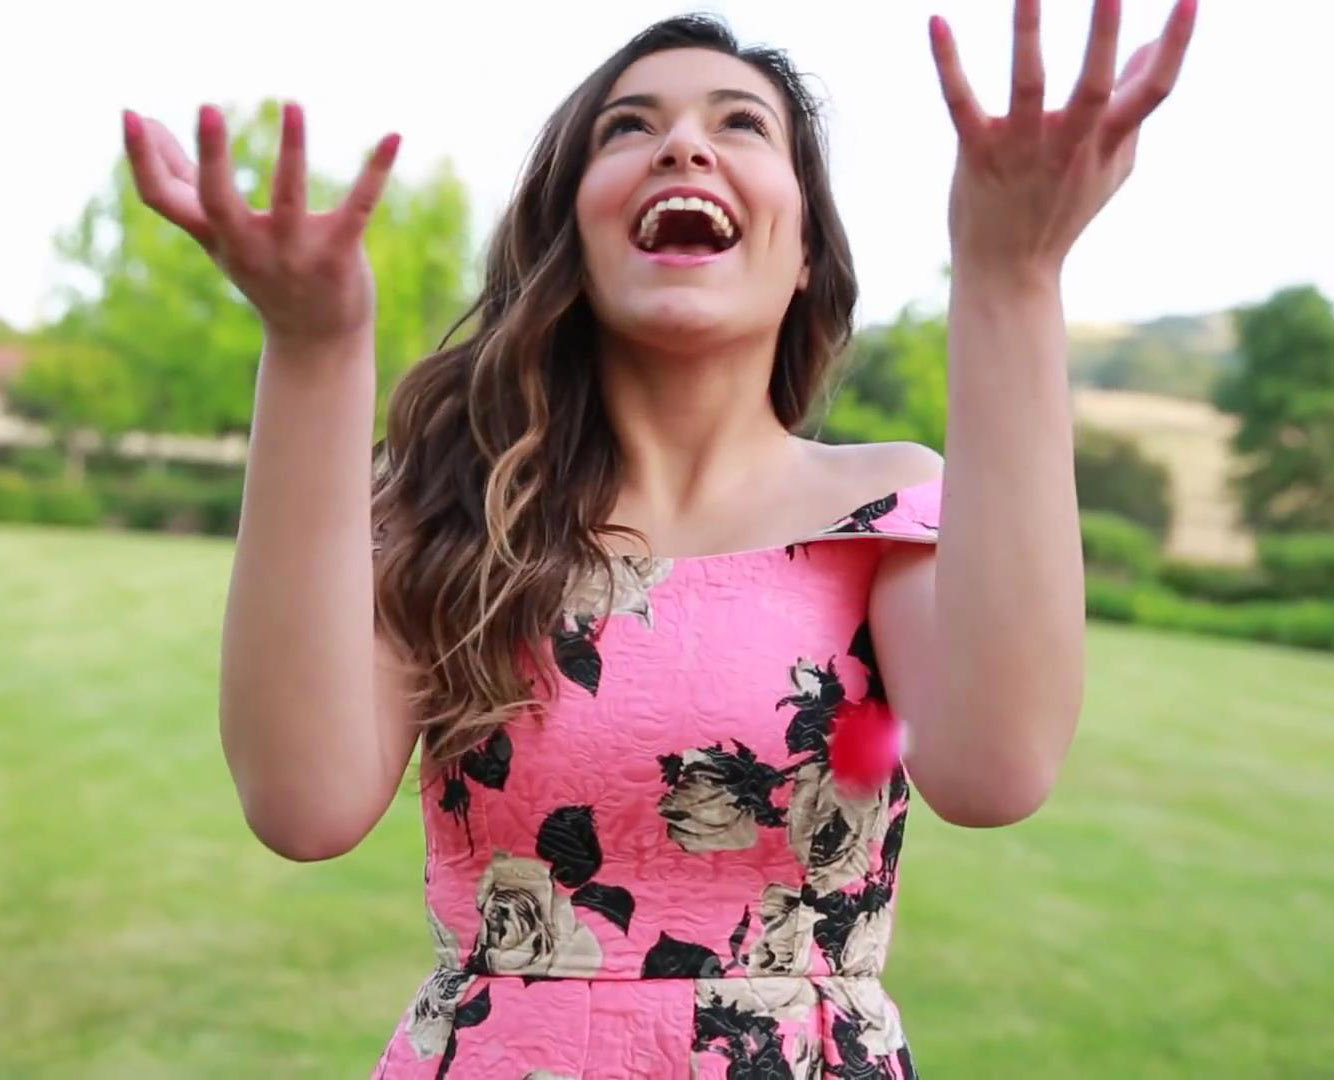 Novas Celebridades. YouTubers. Bethany Mota